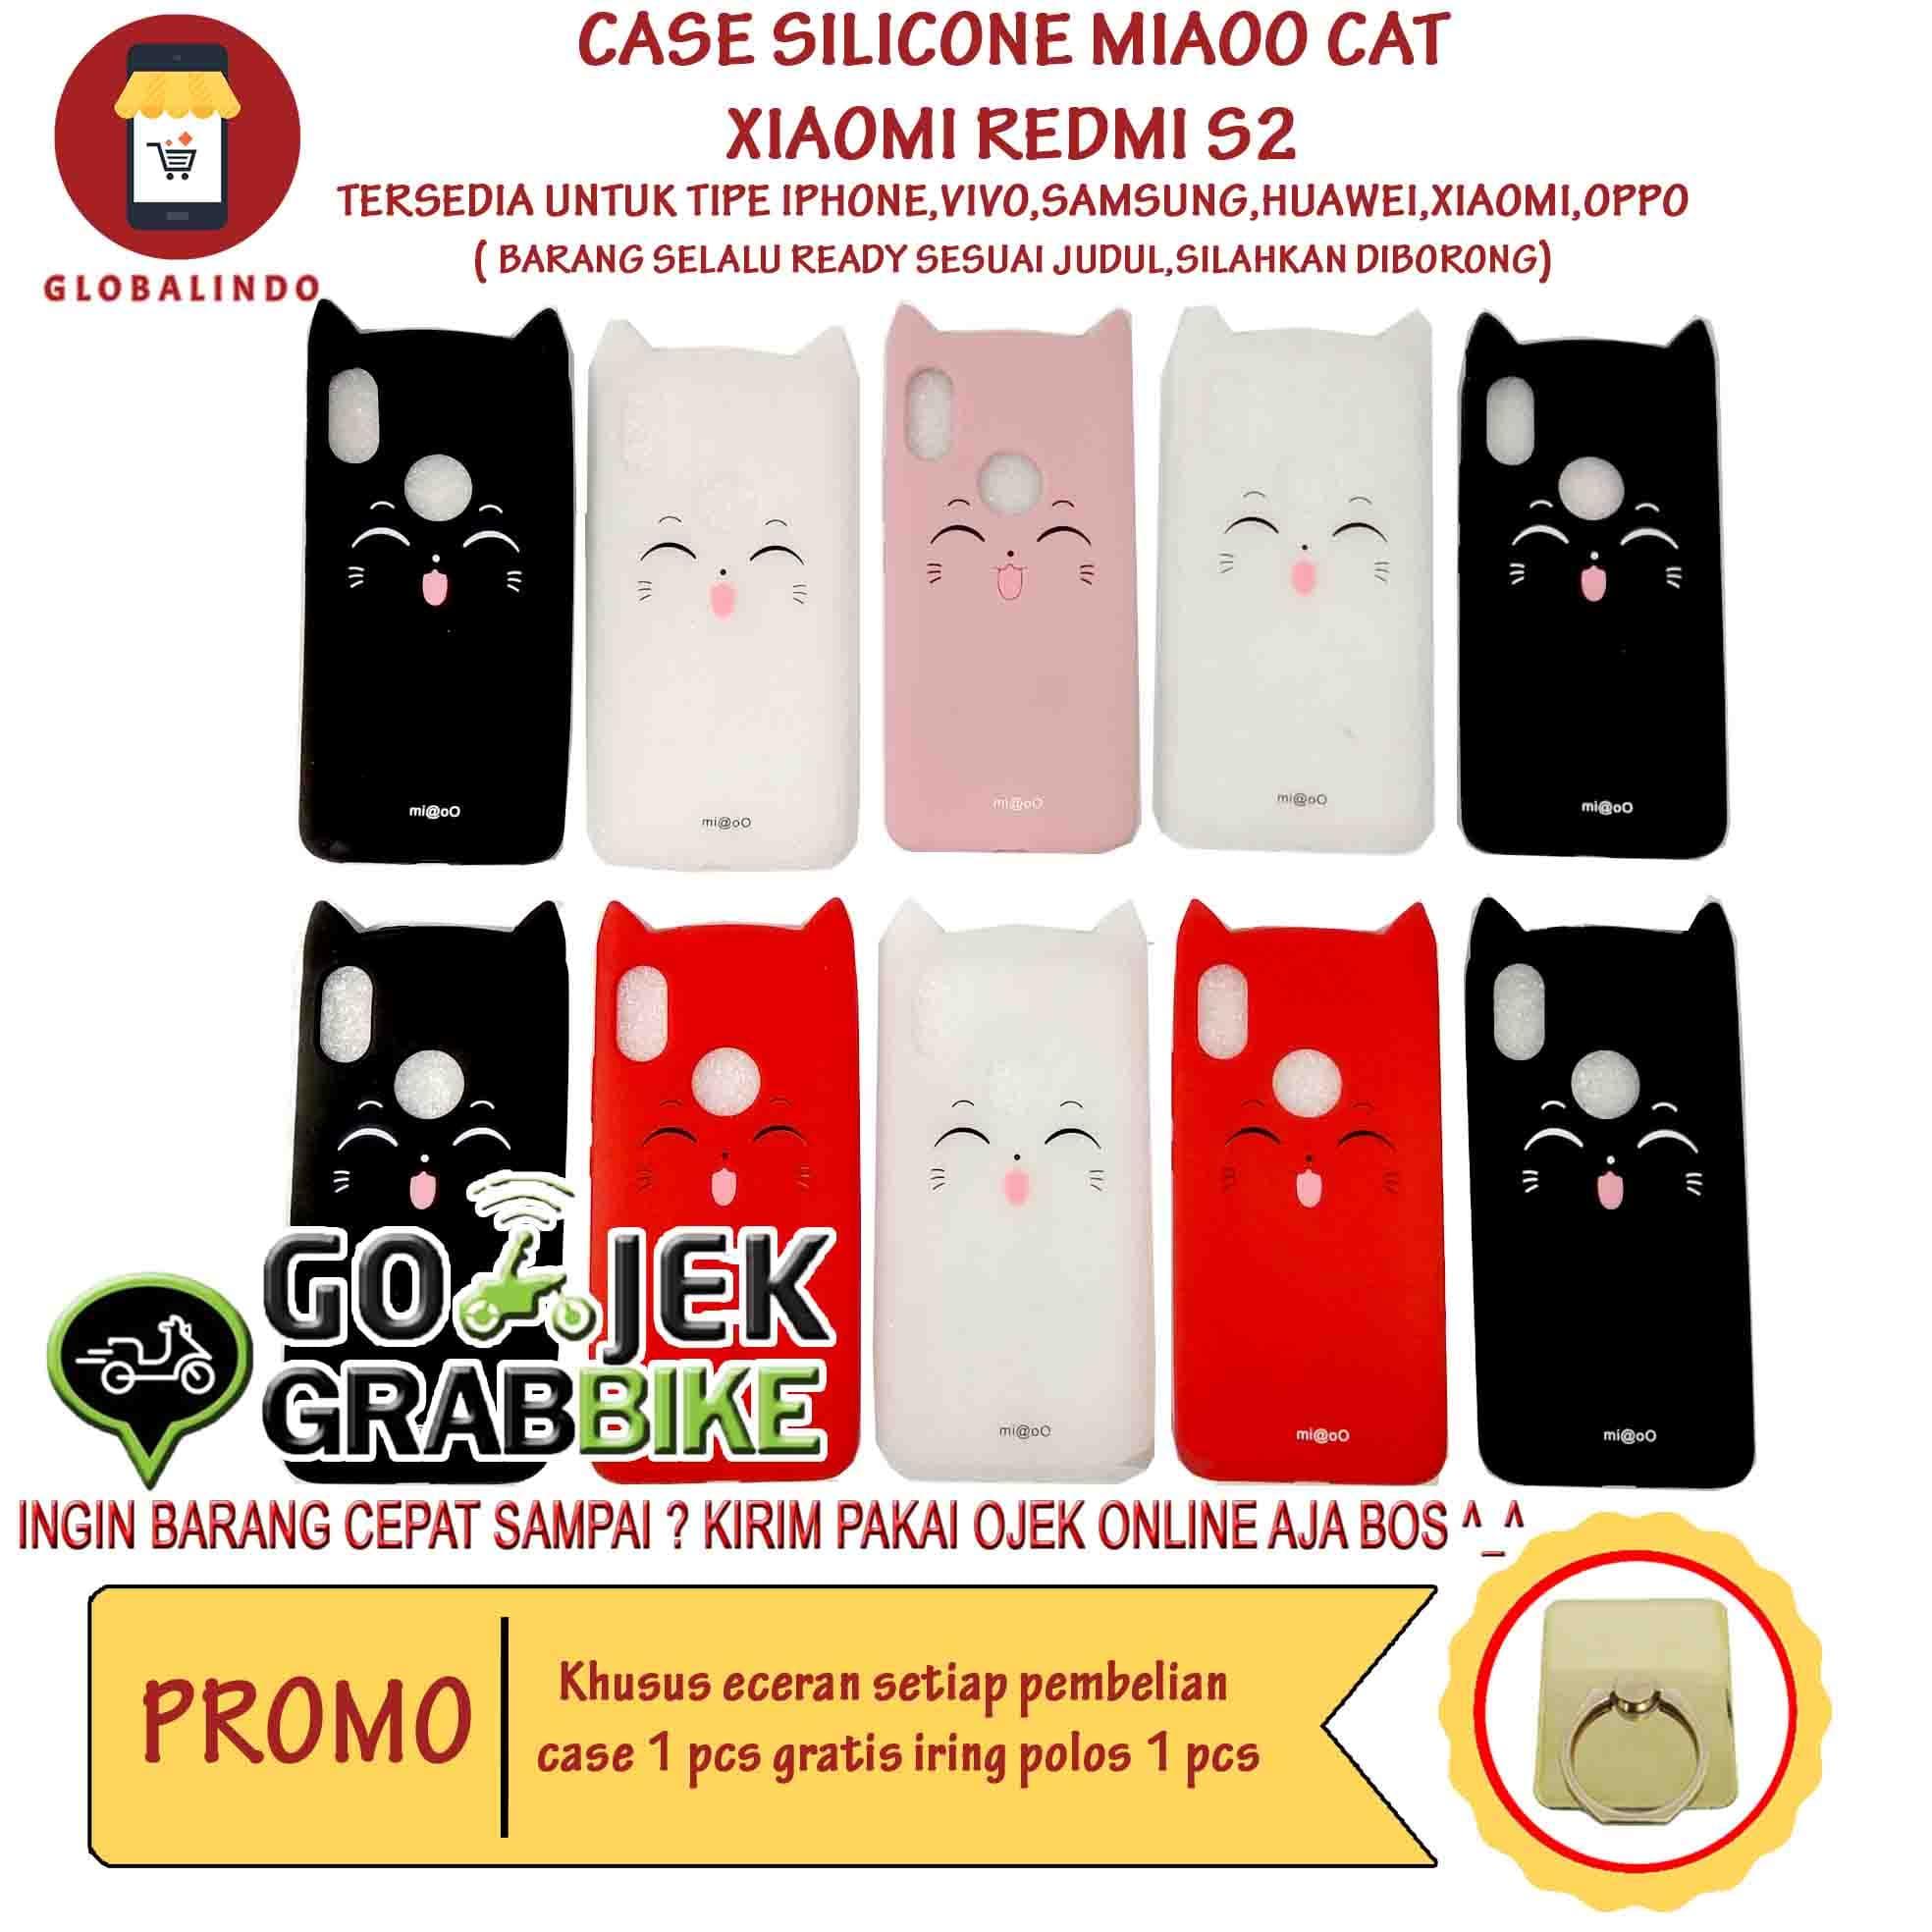 HEMAT Paling Bagus Termurah Xiaomi Redmi S2 Case MiaOo Cat Casing Kucing Hp 280db325fd